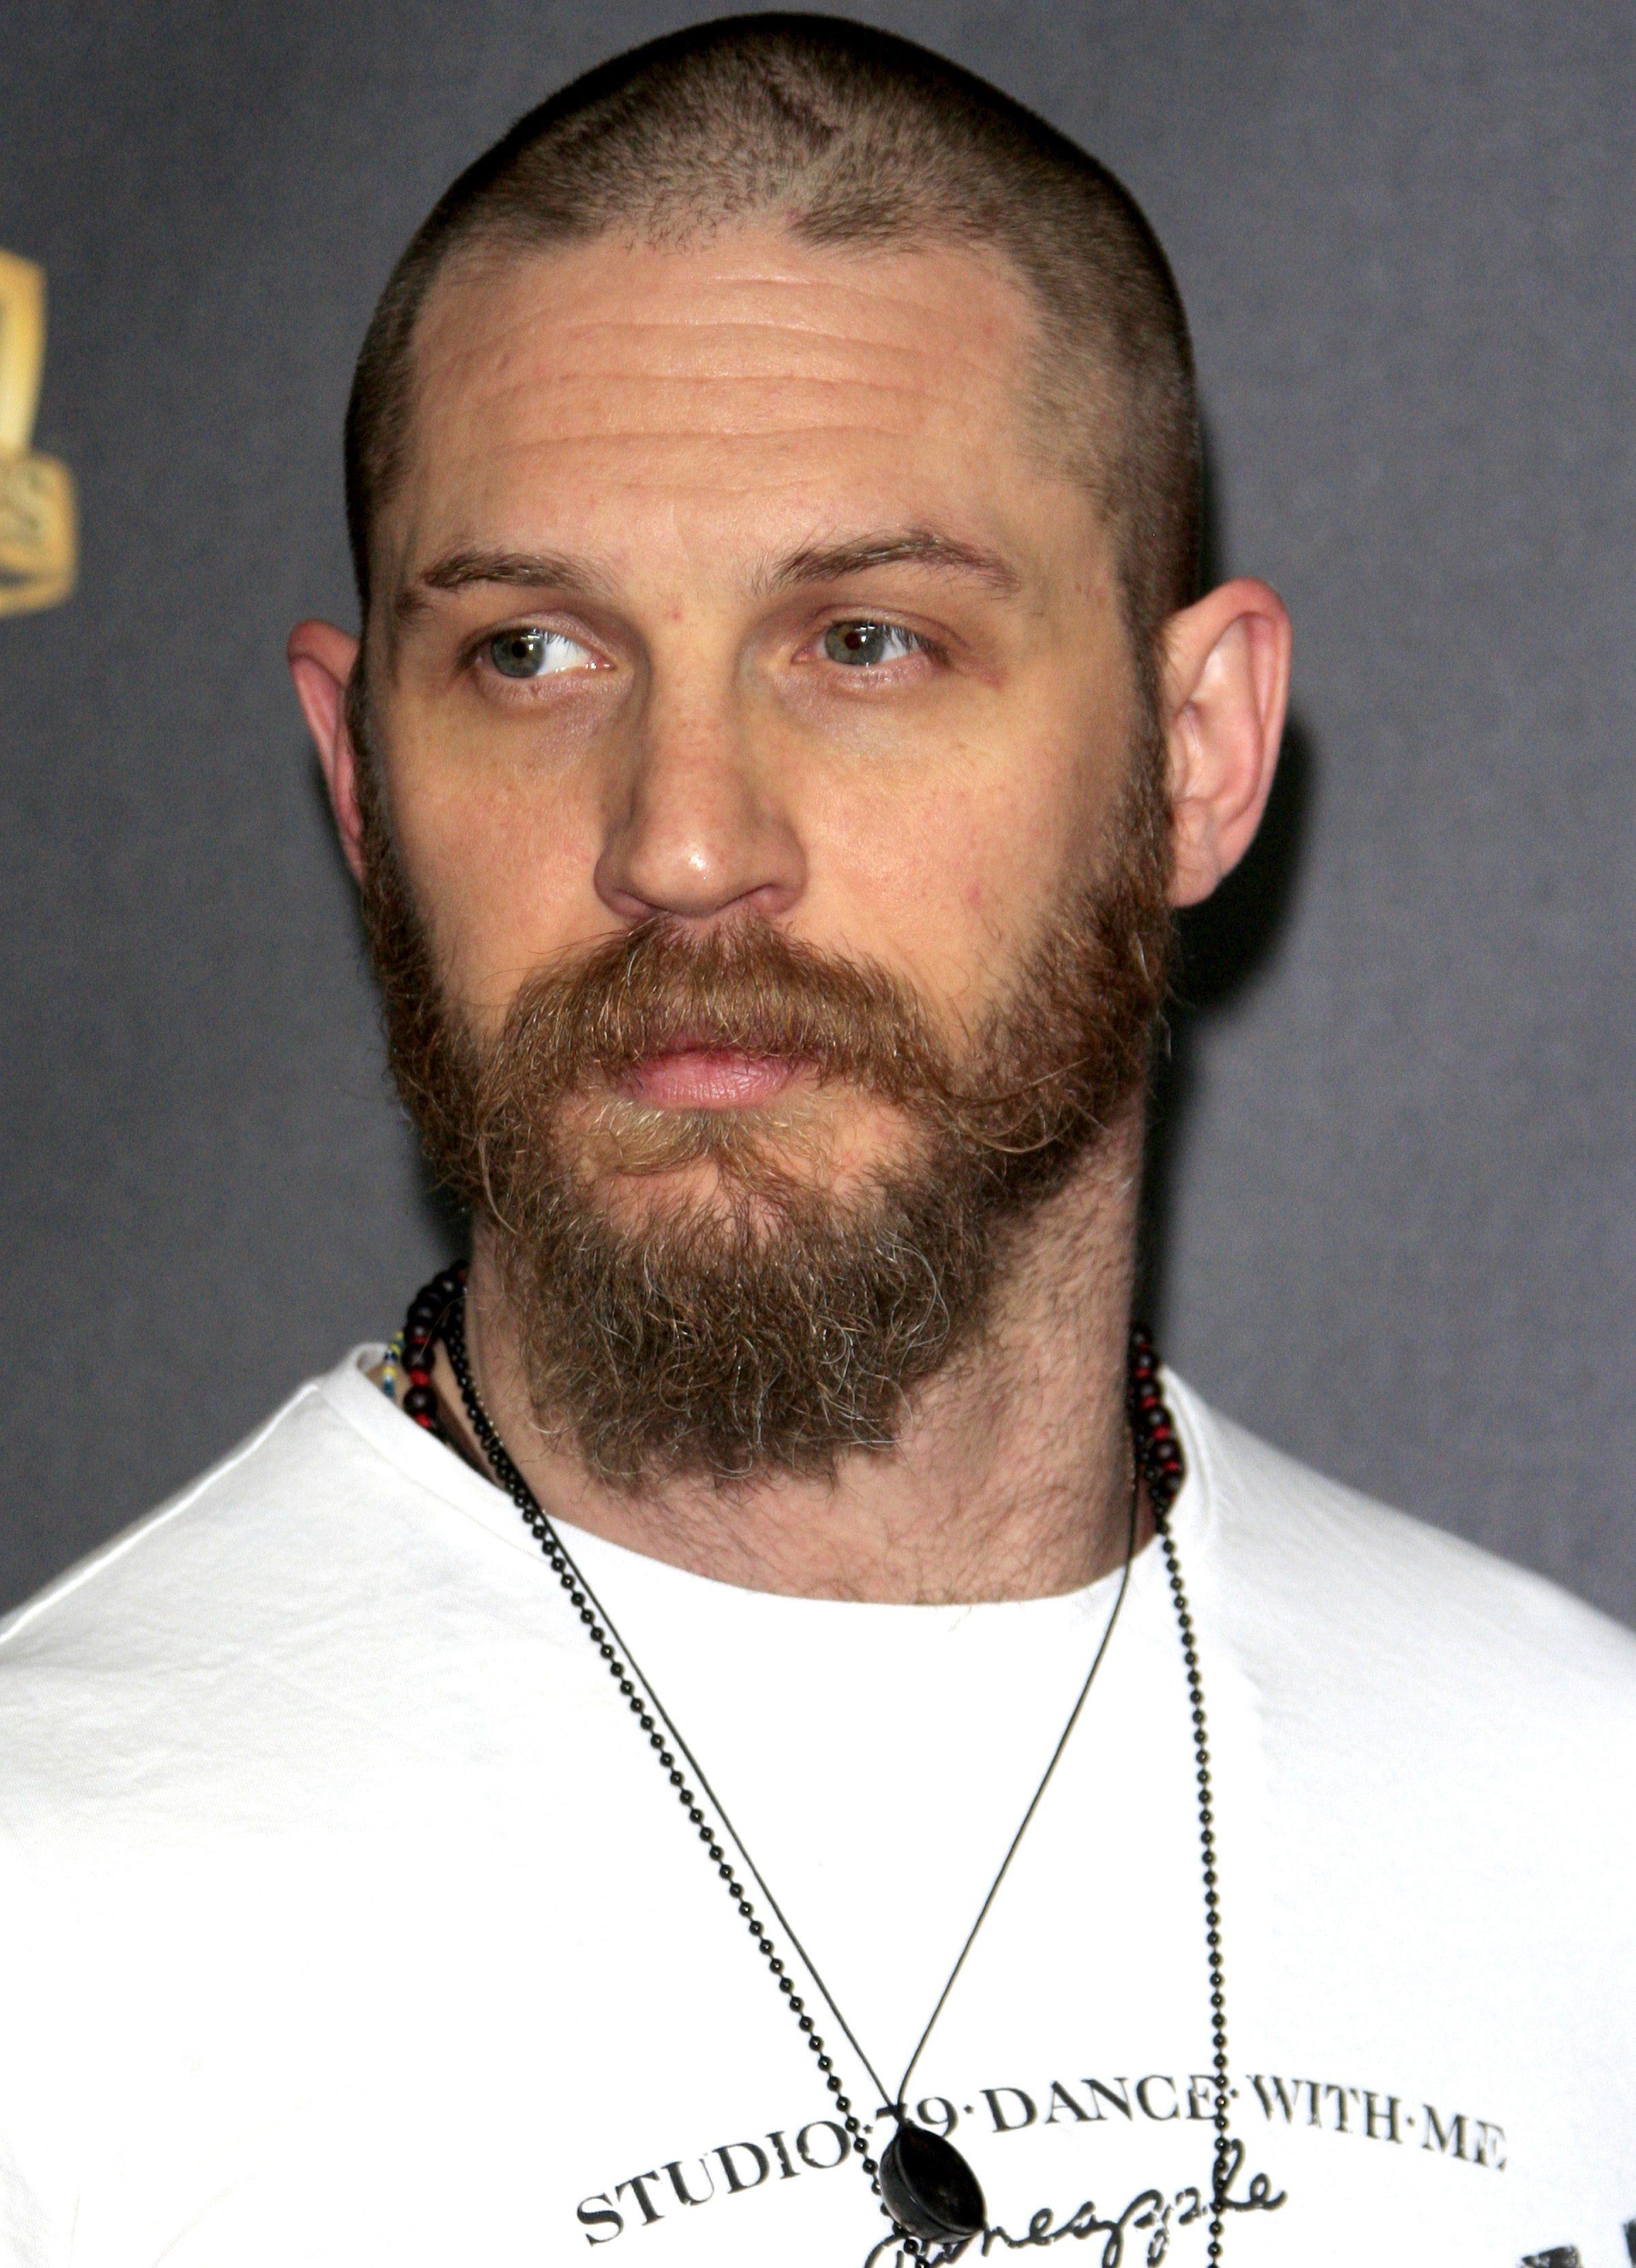 Rugged Beard with Buzz Cut